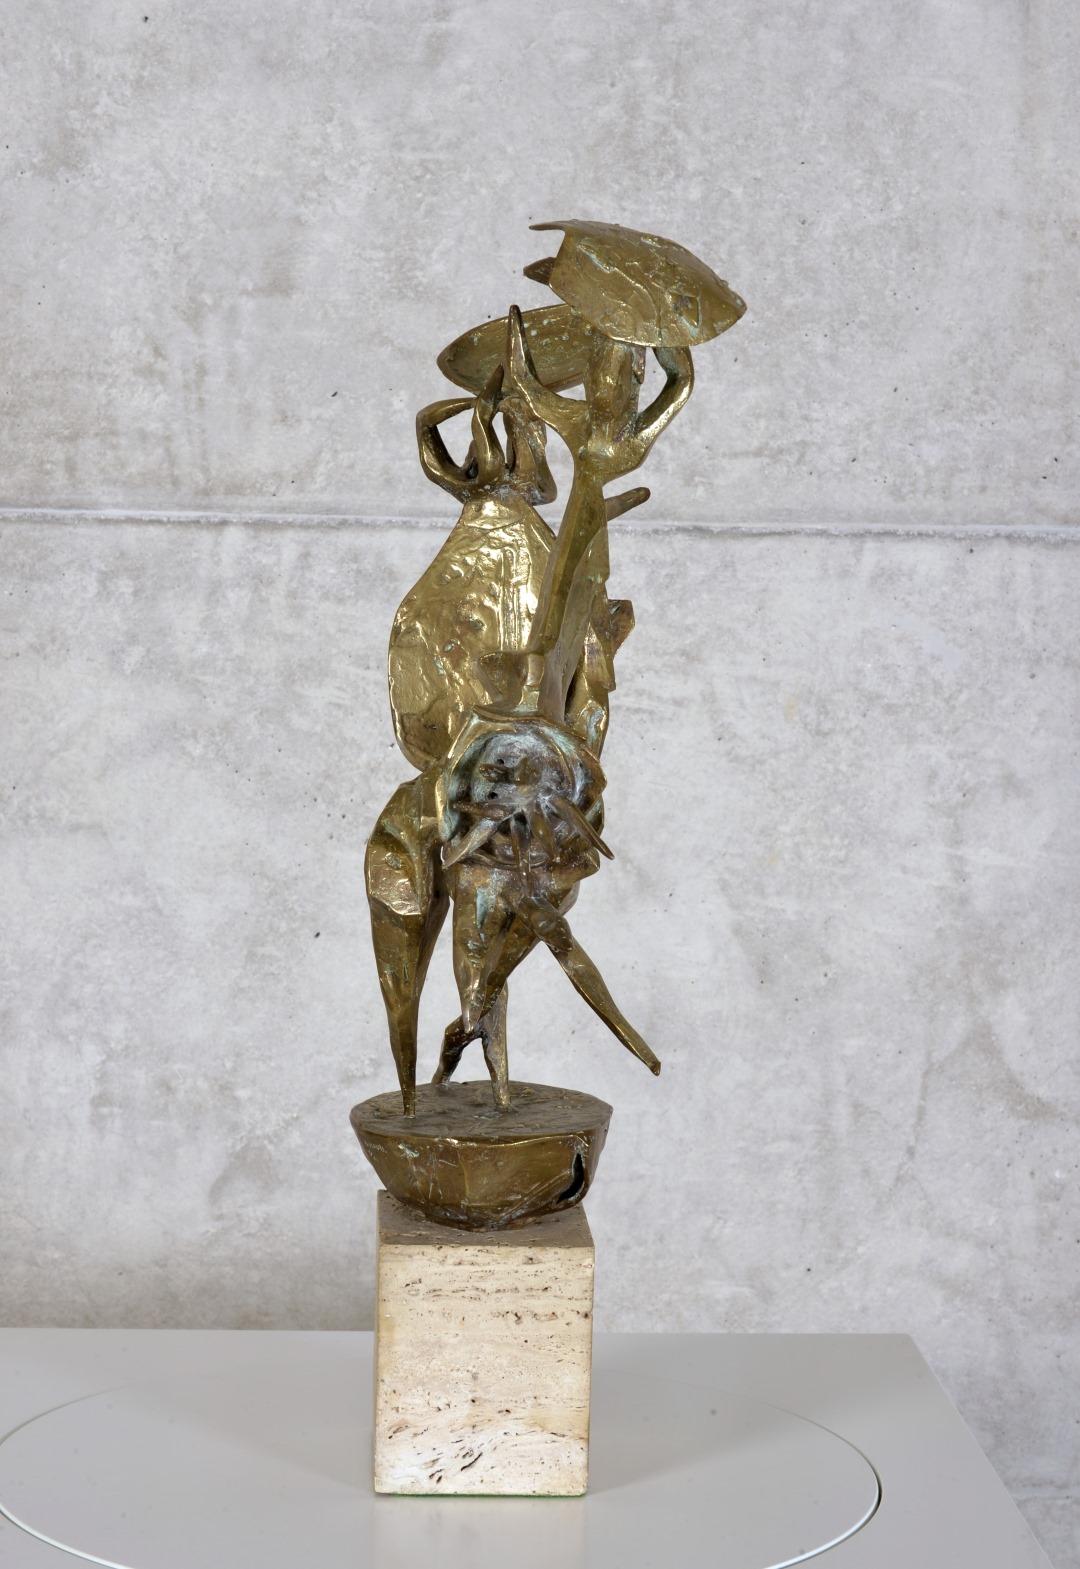 Centaur with shields